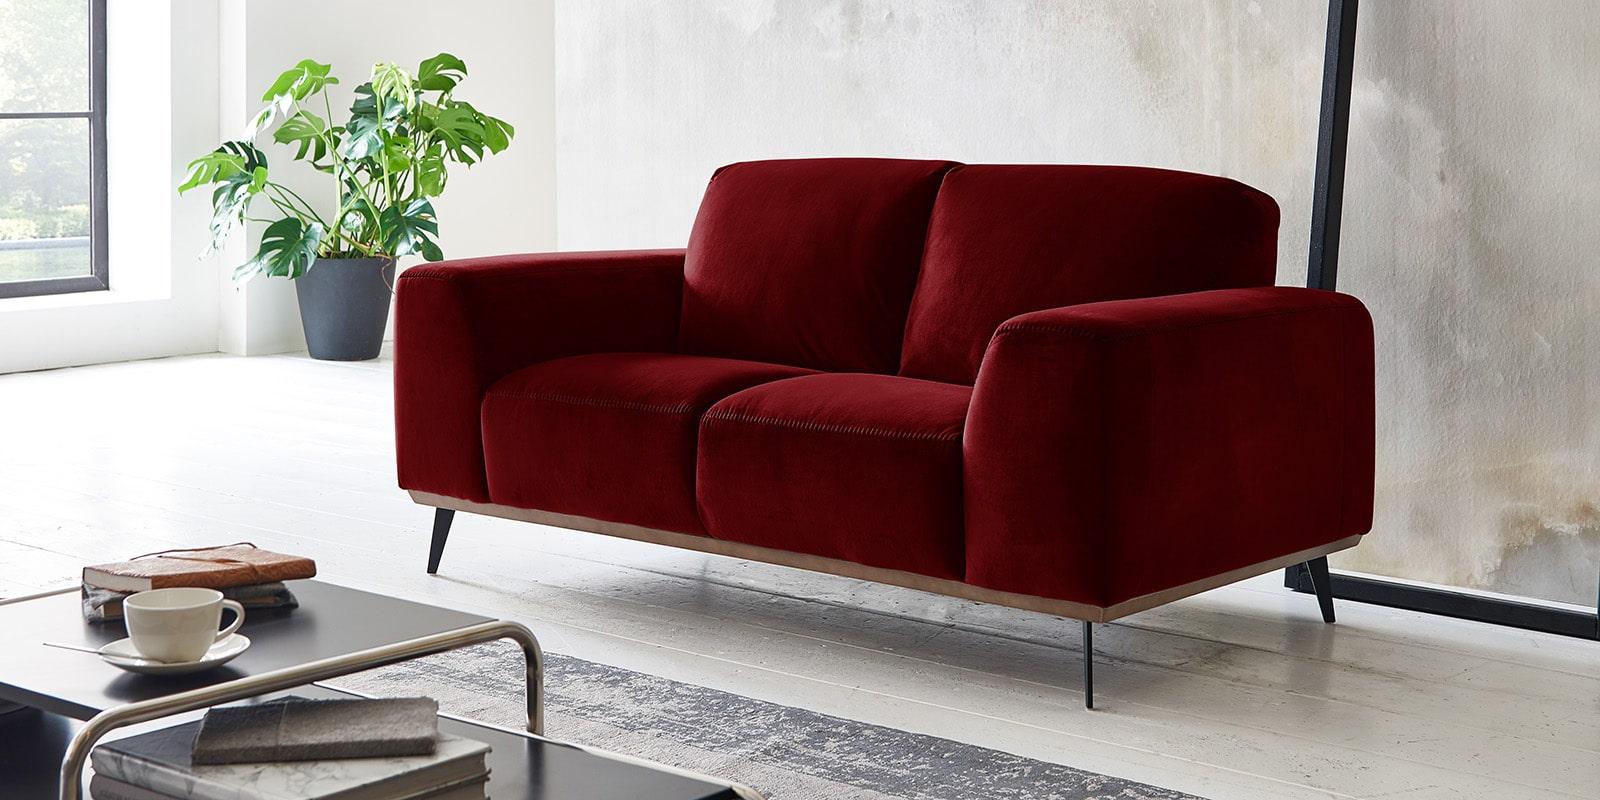 Moebella24 - 2-Sitzer - Sofa - Barcelona - Samt - Rot - Skandinavisches - Design - Punto - cavallo - Nähte